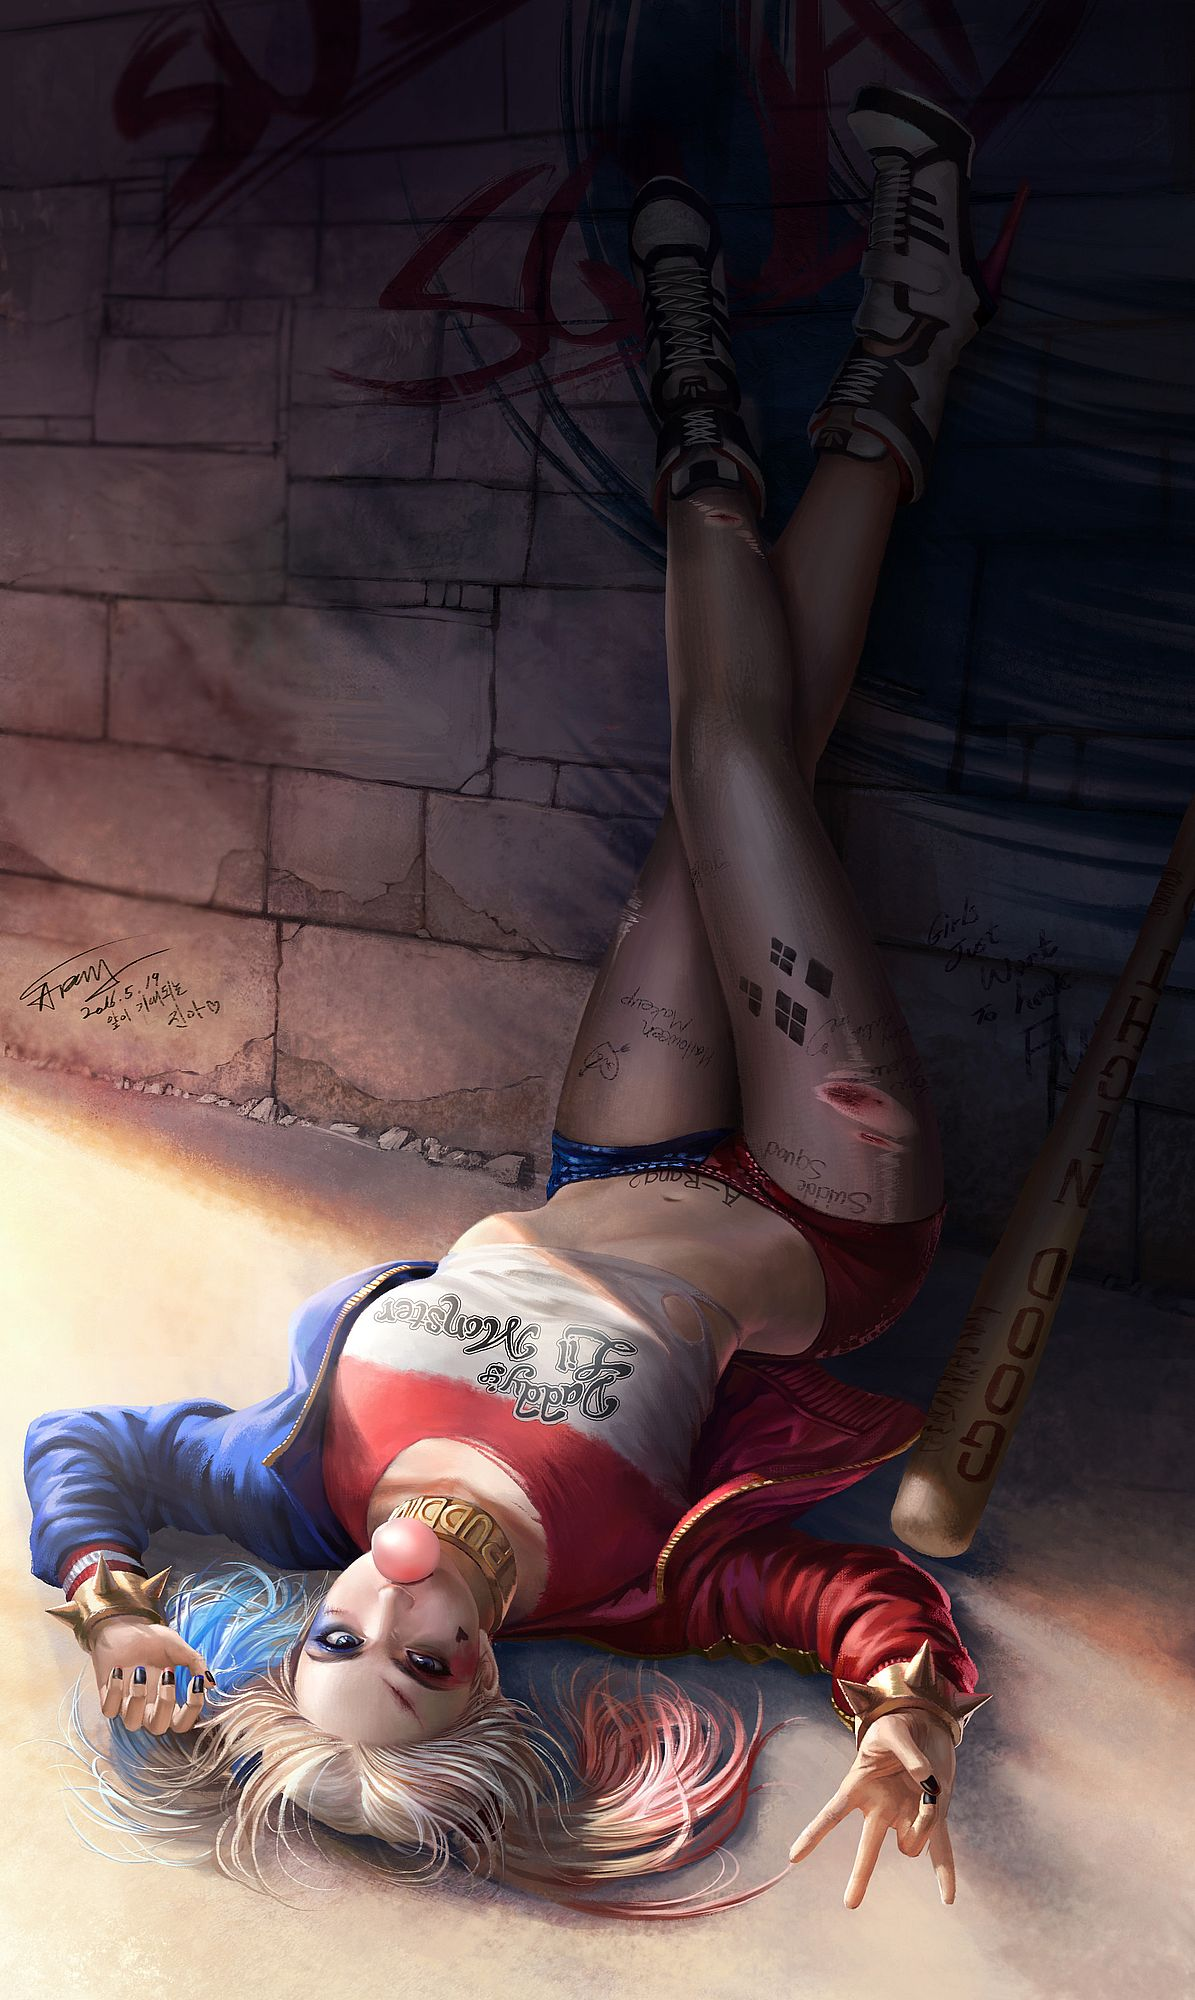 Harley Quinn Margot Robbie Dc Comics Fanart Artist A Rang Taekwon Kim Other Games Waifu Clan Anime Pics Digital Art